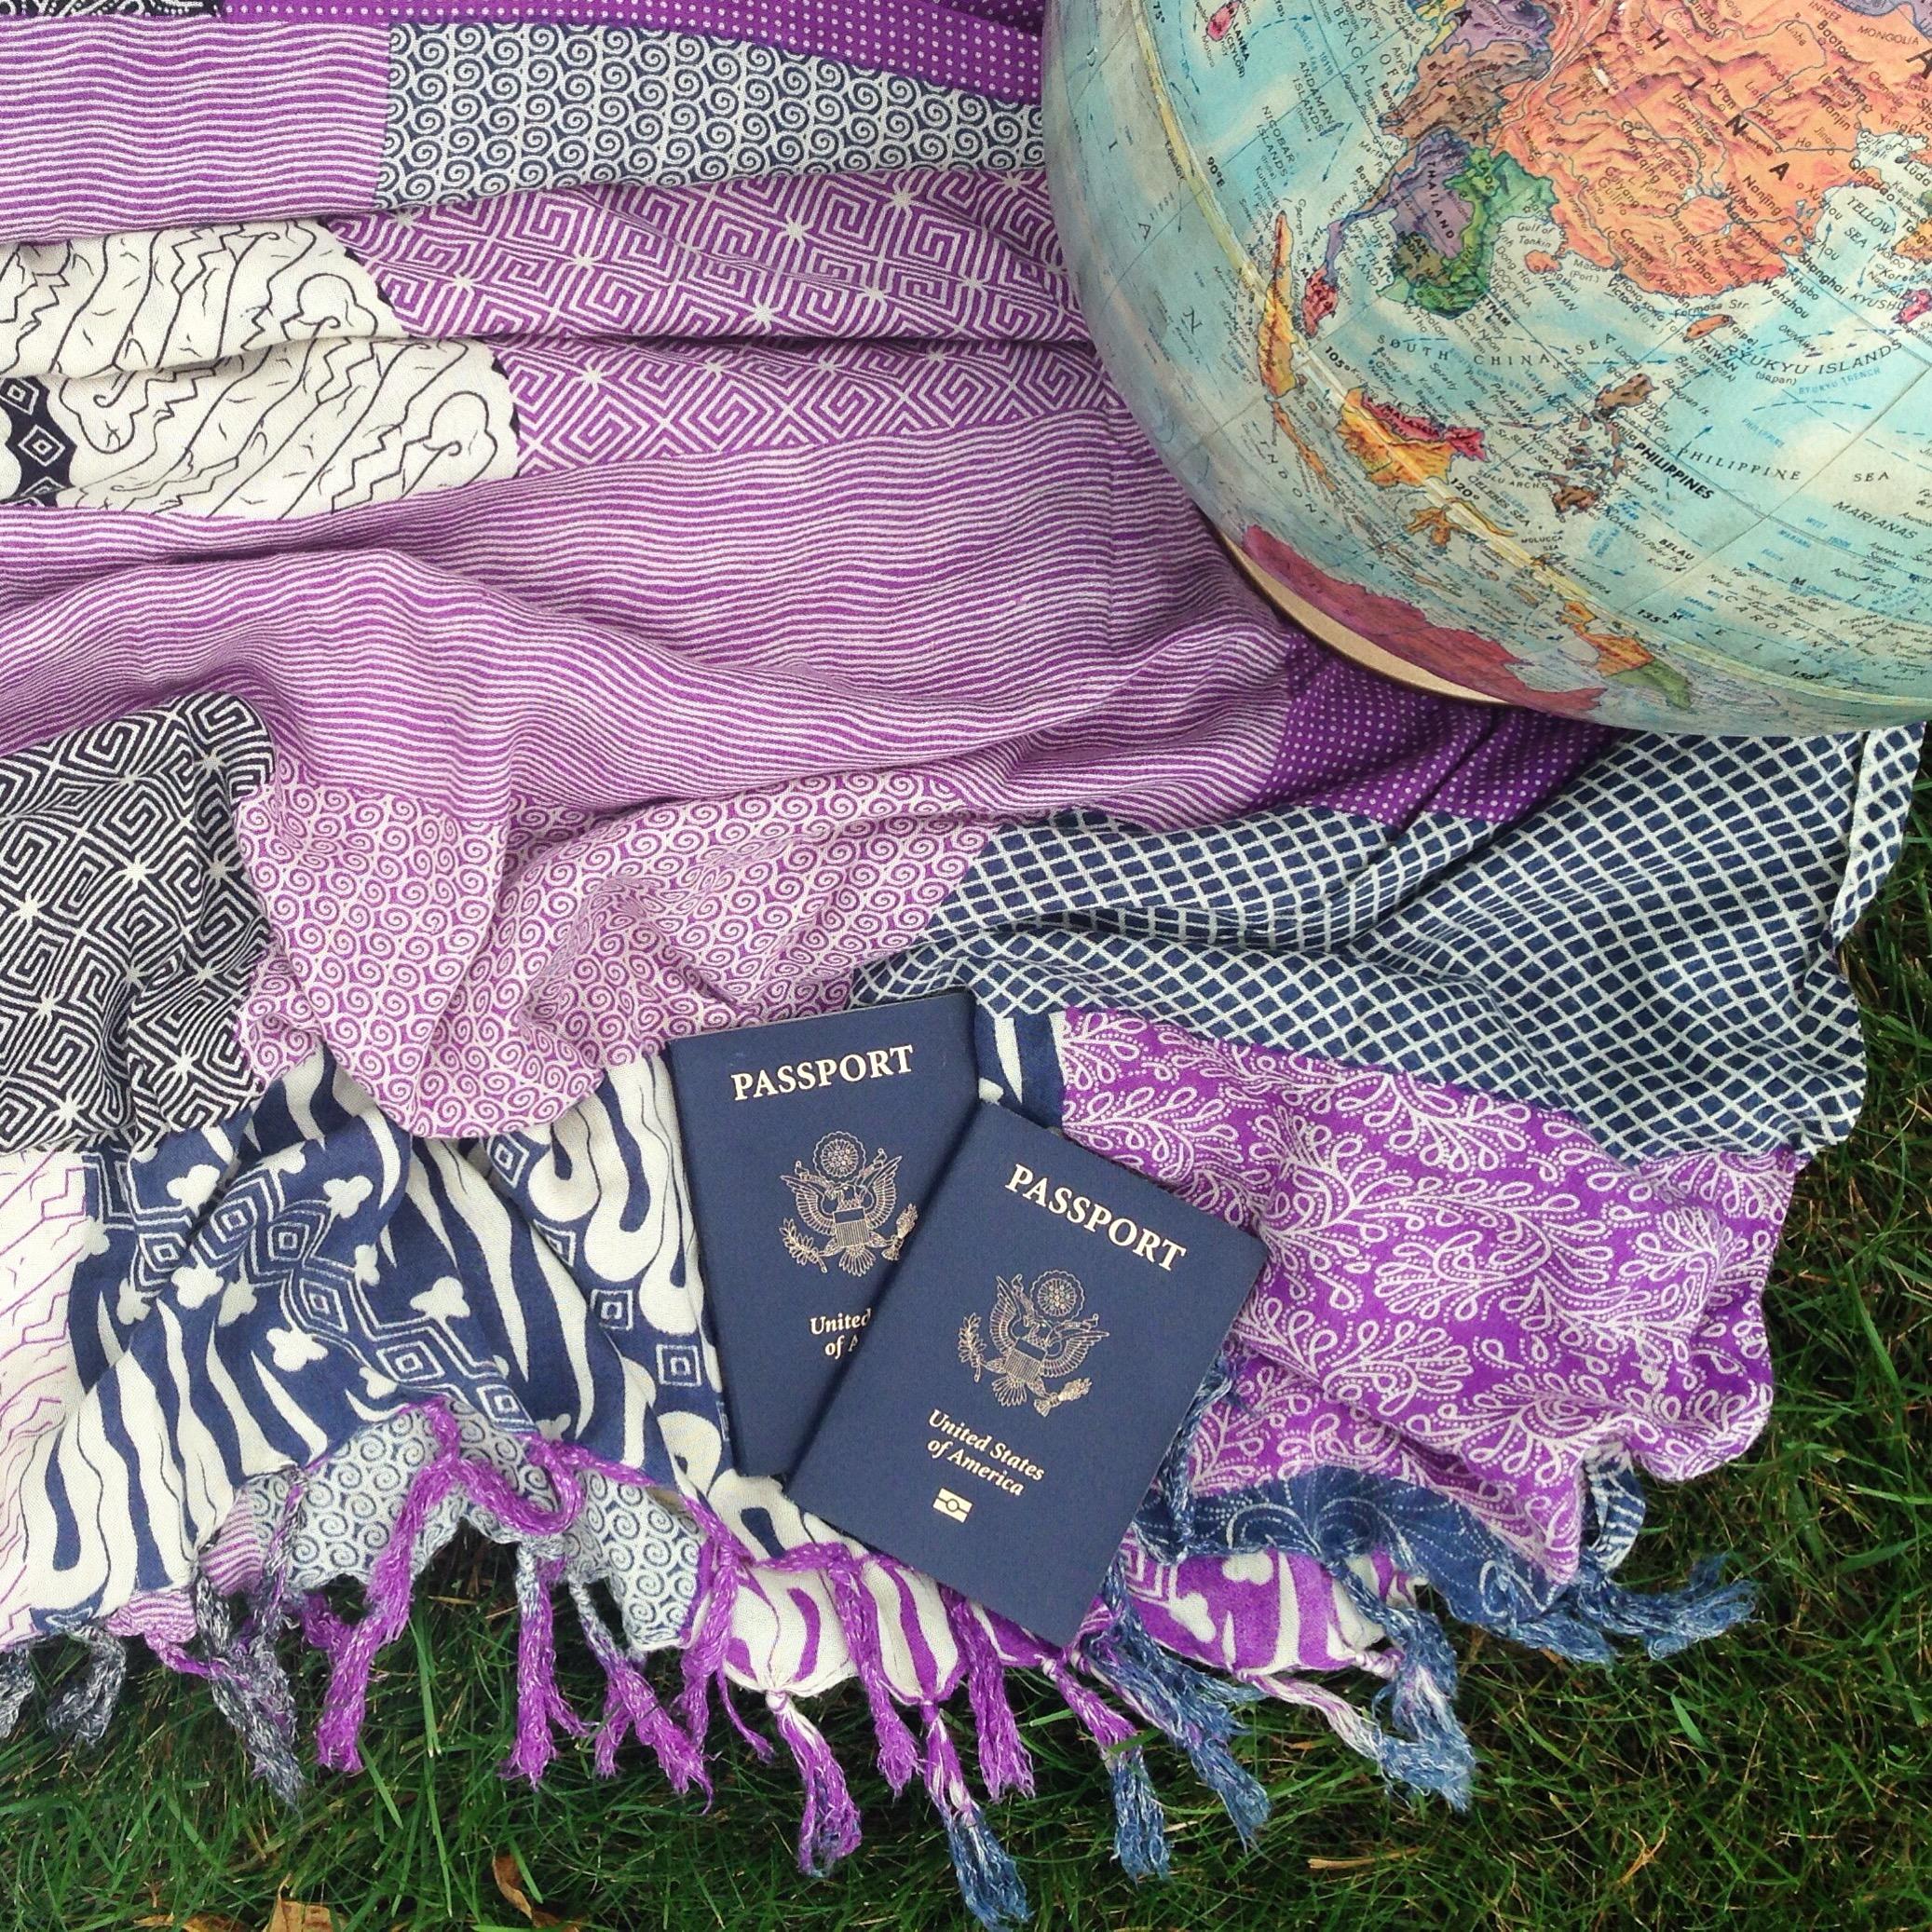 American Passport Traveling as an American